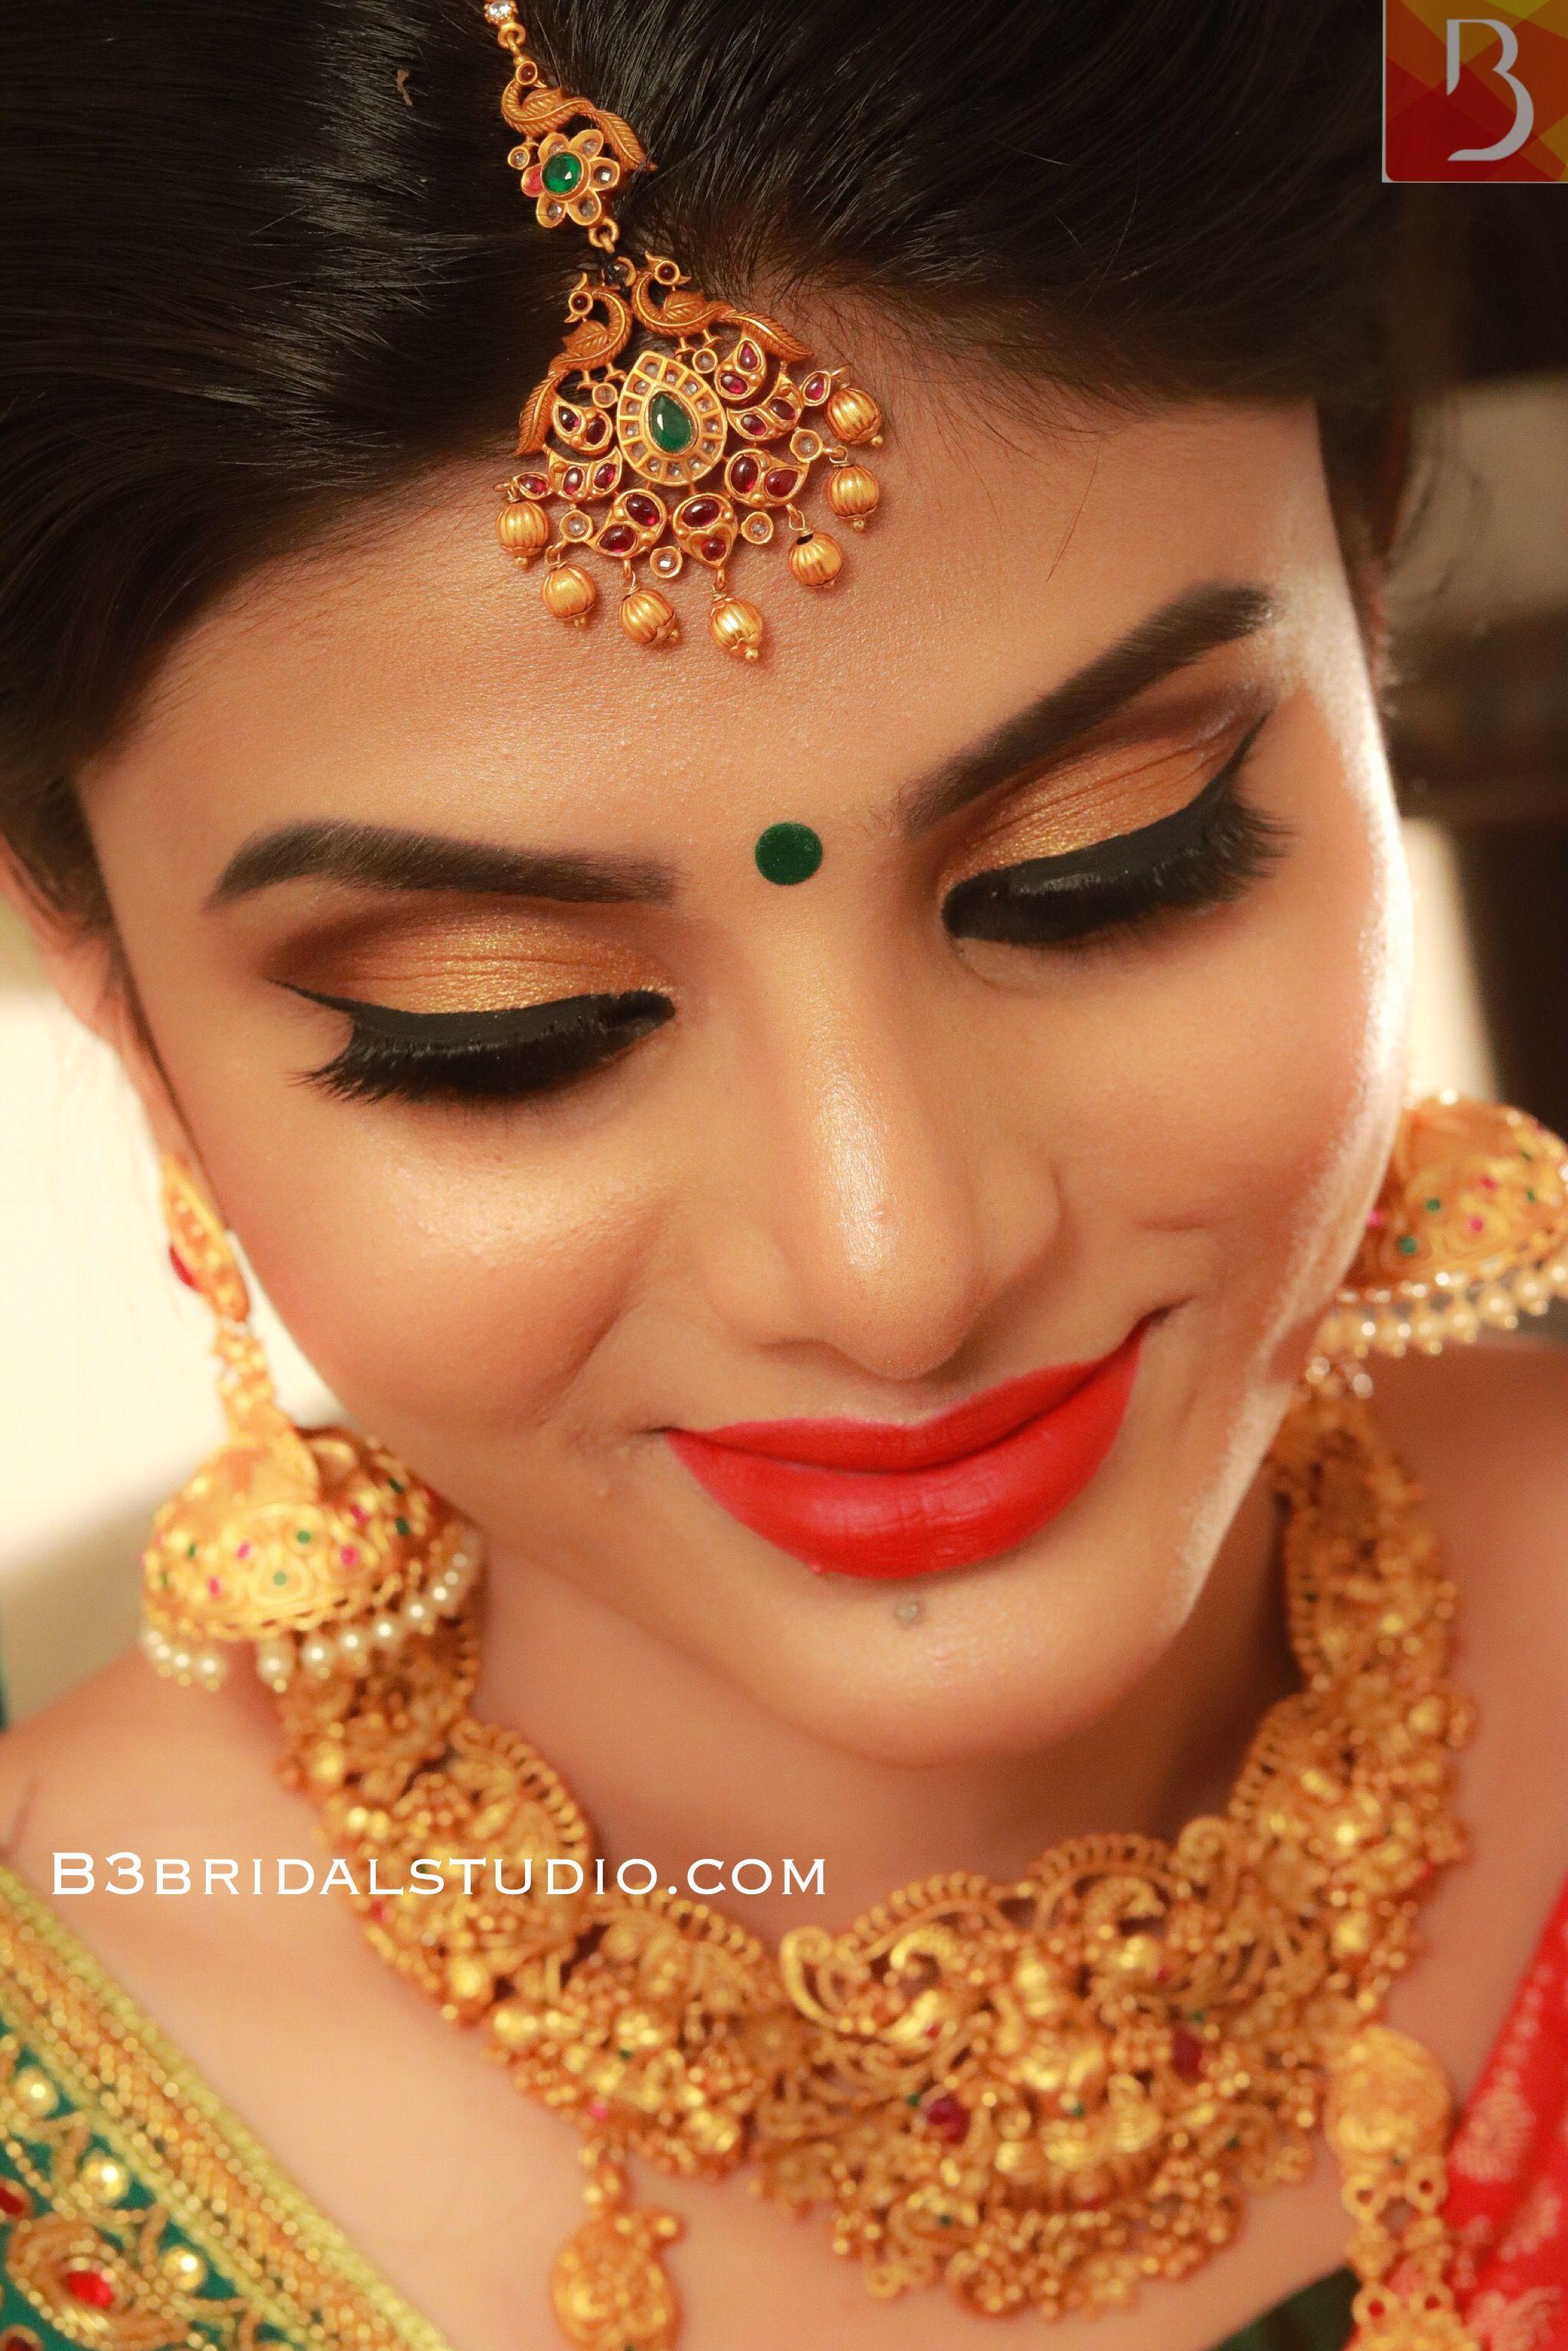 South Indian Bridal Makeup By Karthika B3bridalstudio Contact